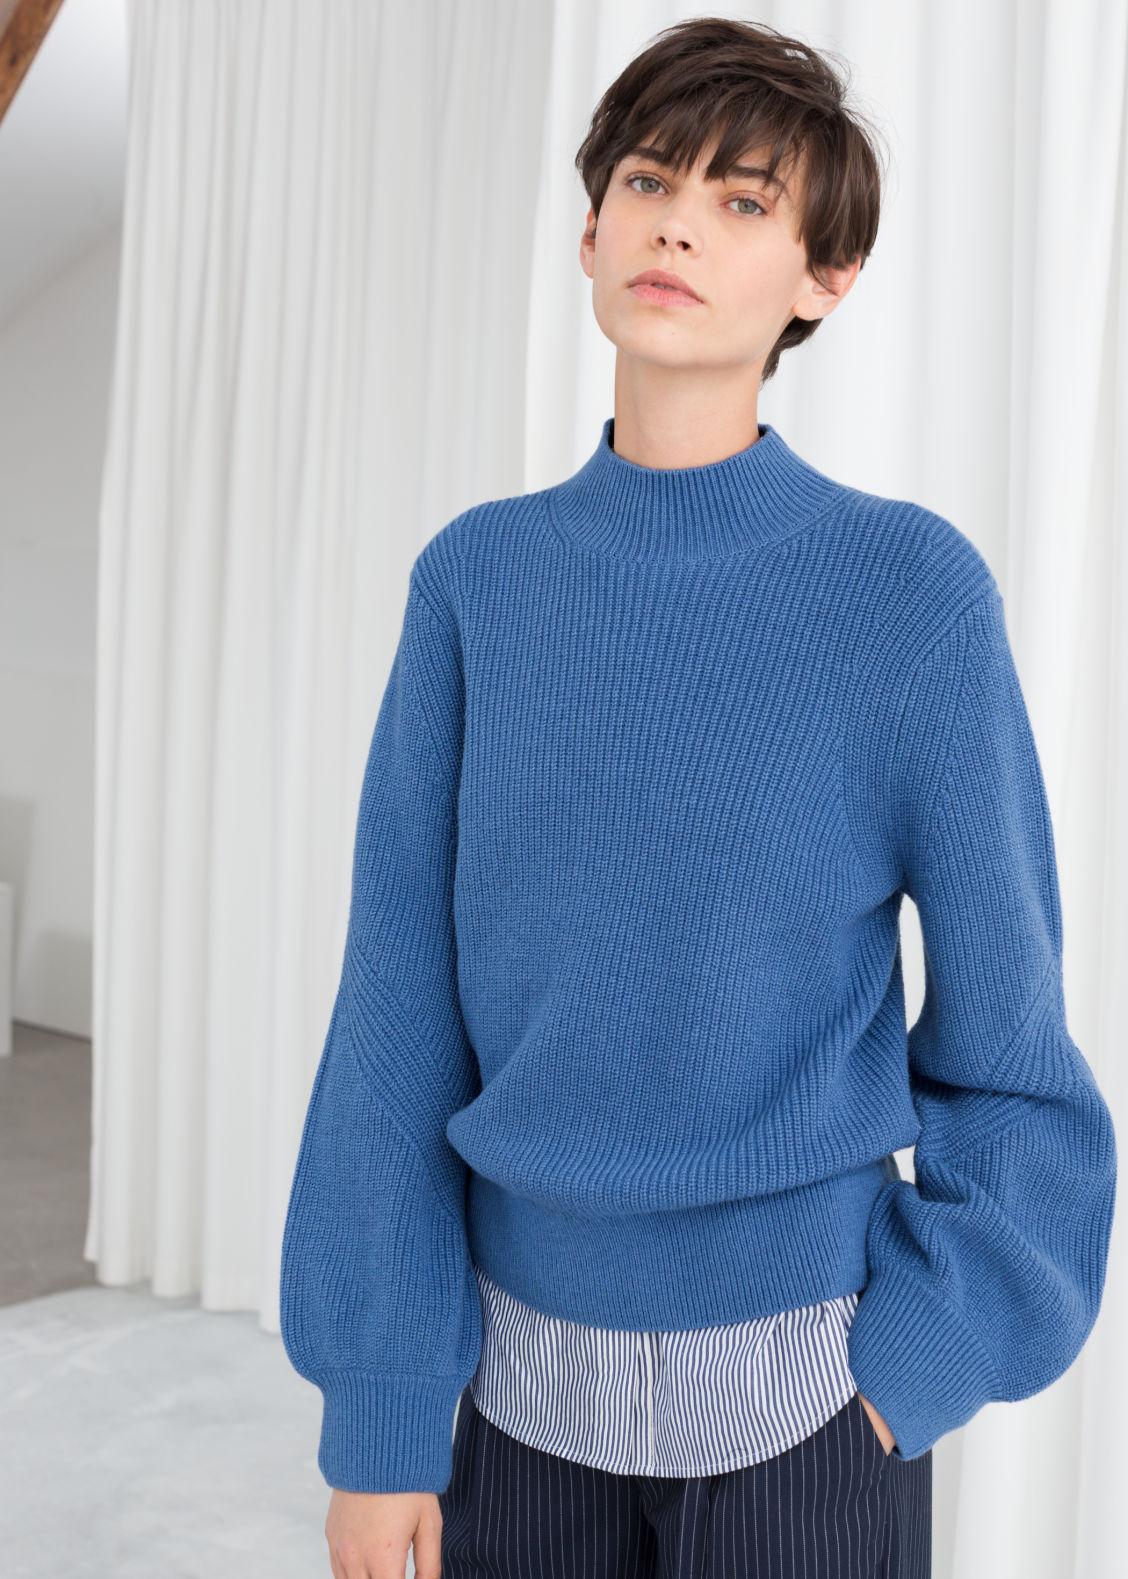 3b135eaca12cbf Balloon Sleeve Sweater - Off Wihite - Sweaters - & Other Stories